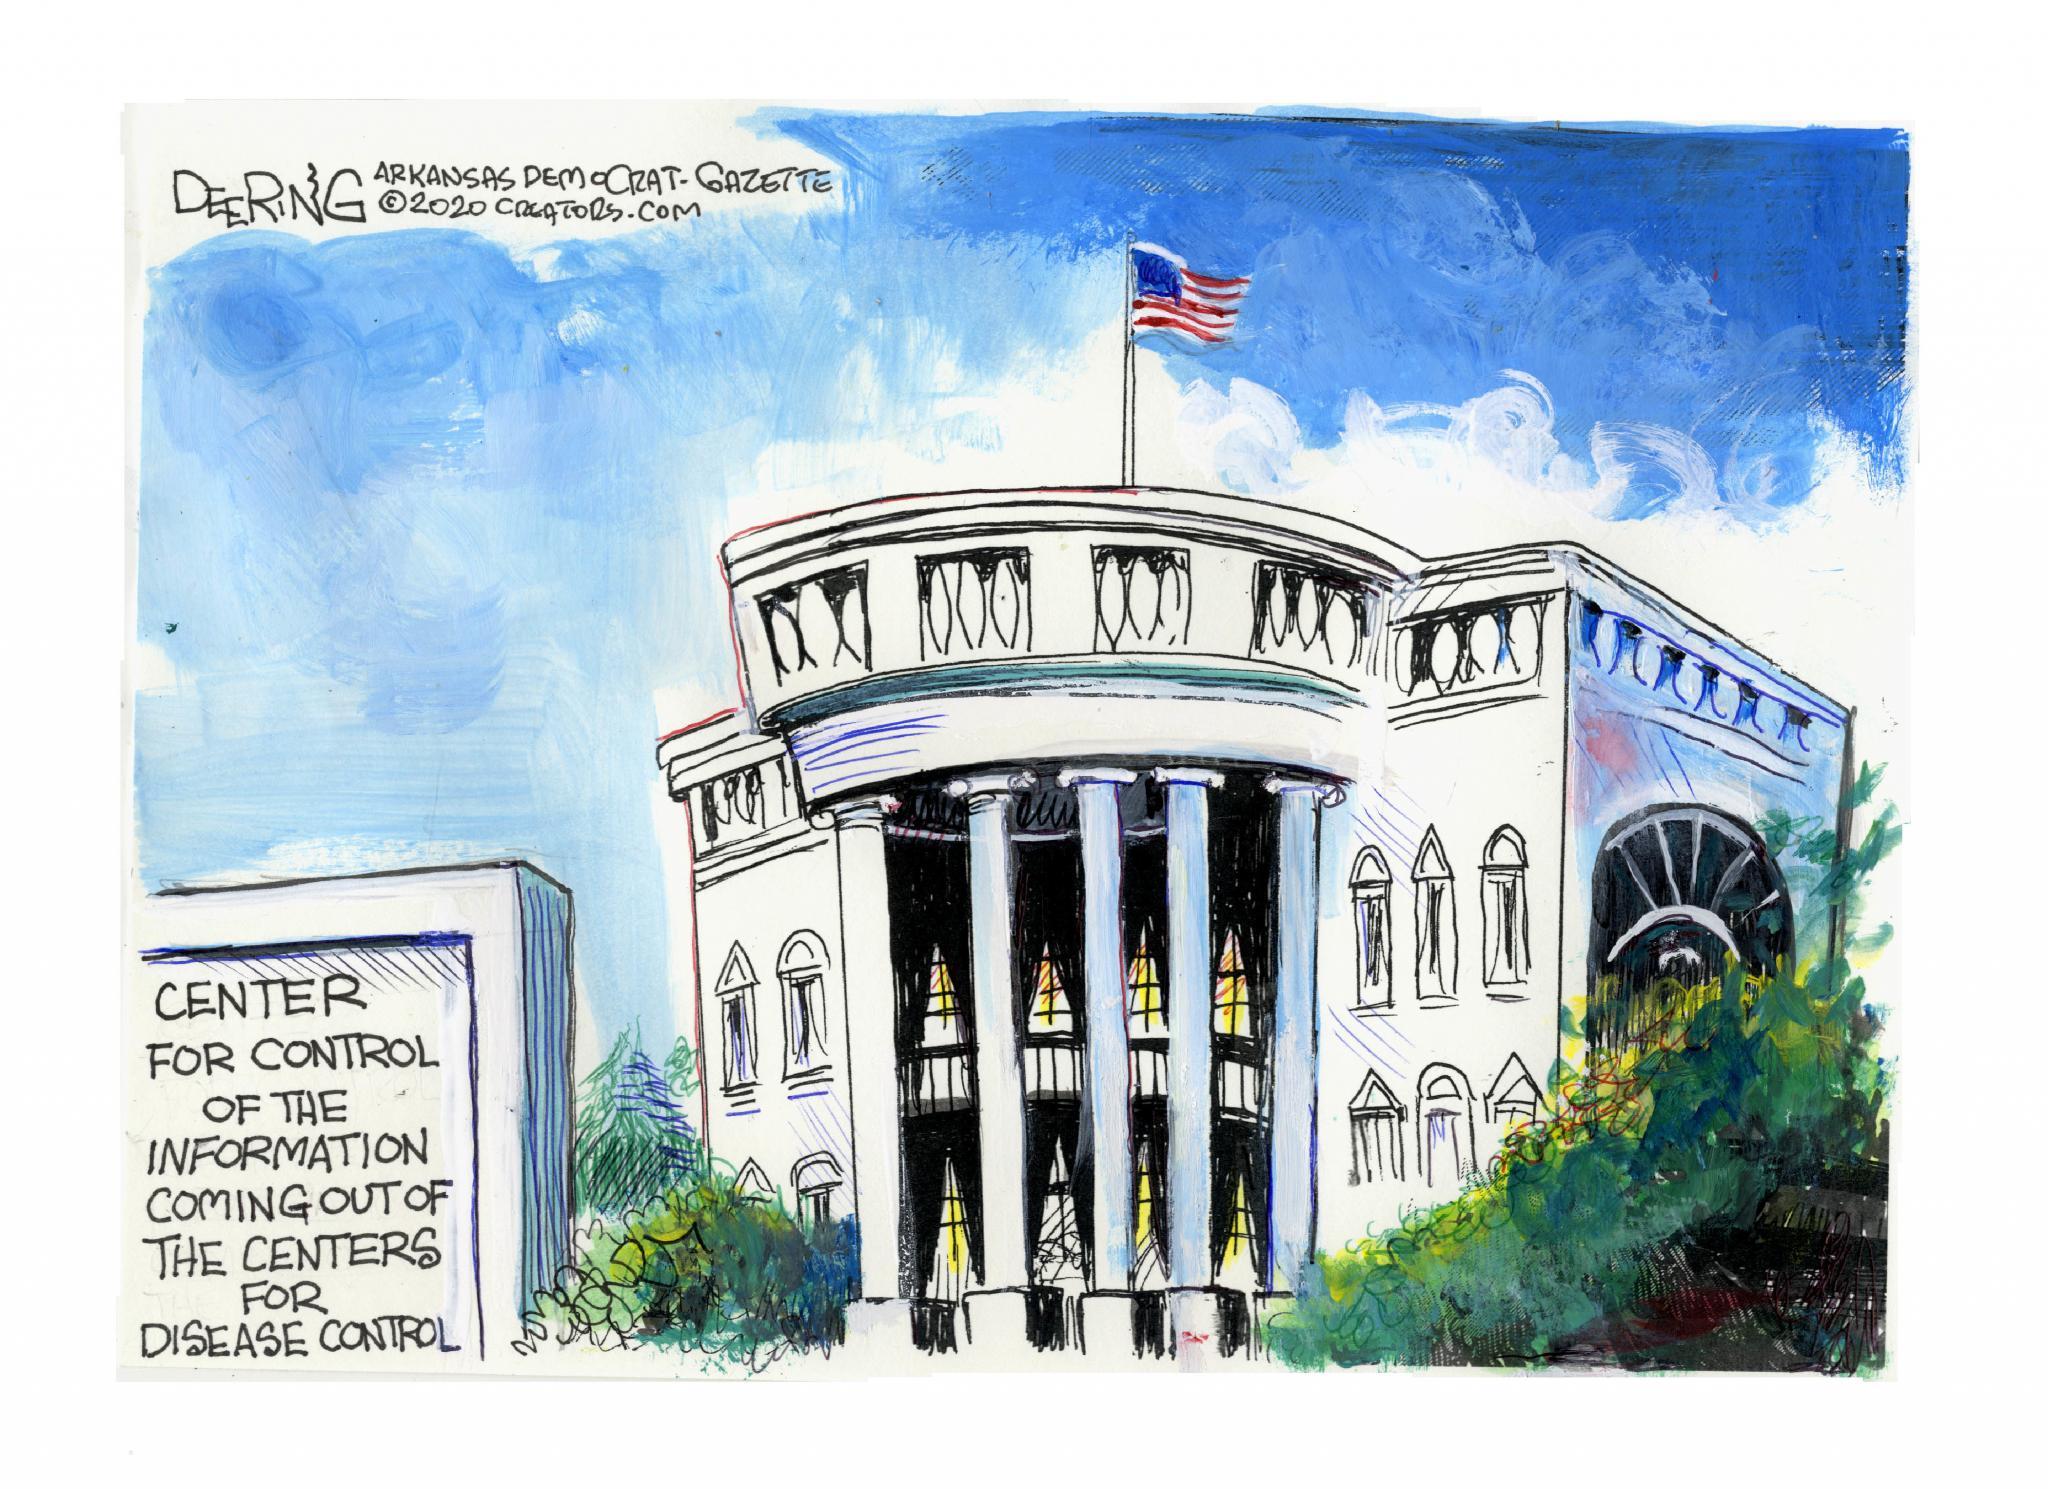 Political cartoons - the 'funny' pics thread.-jd091620dapr-jpg